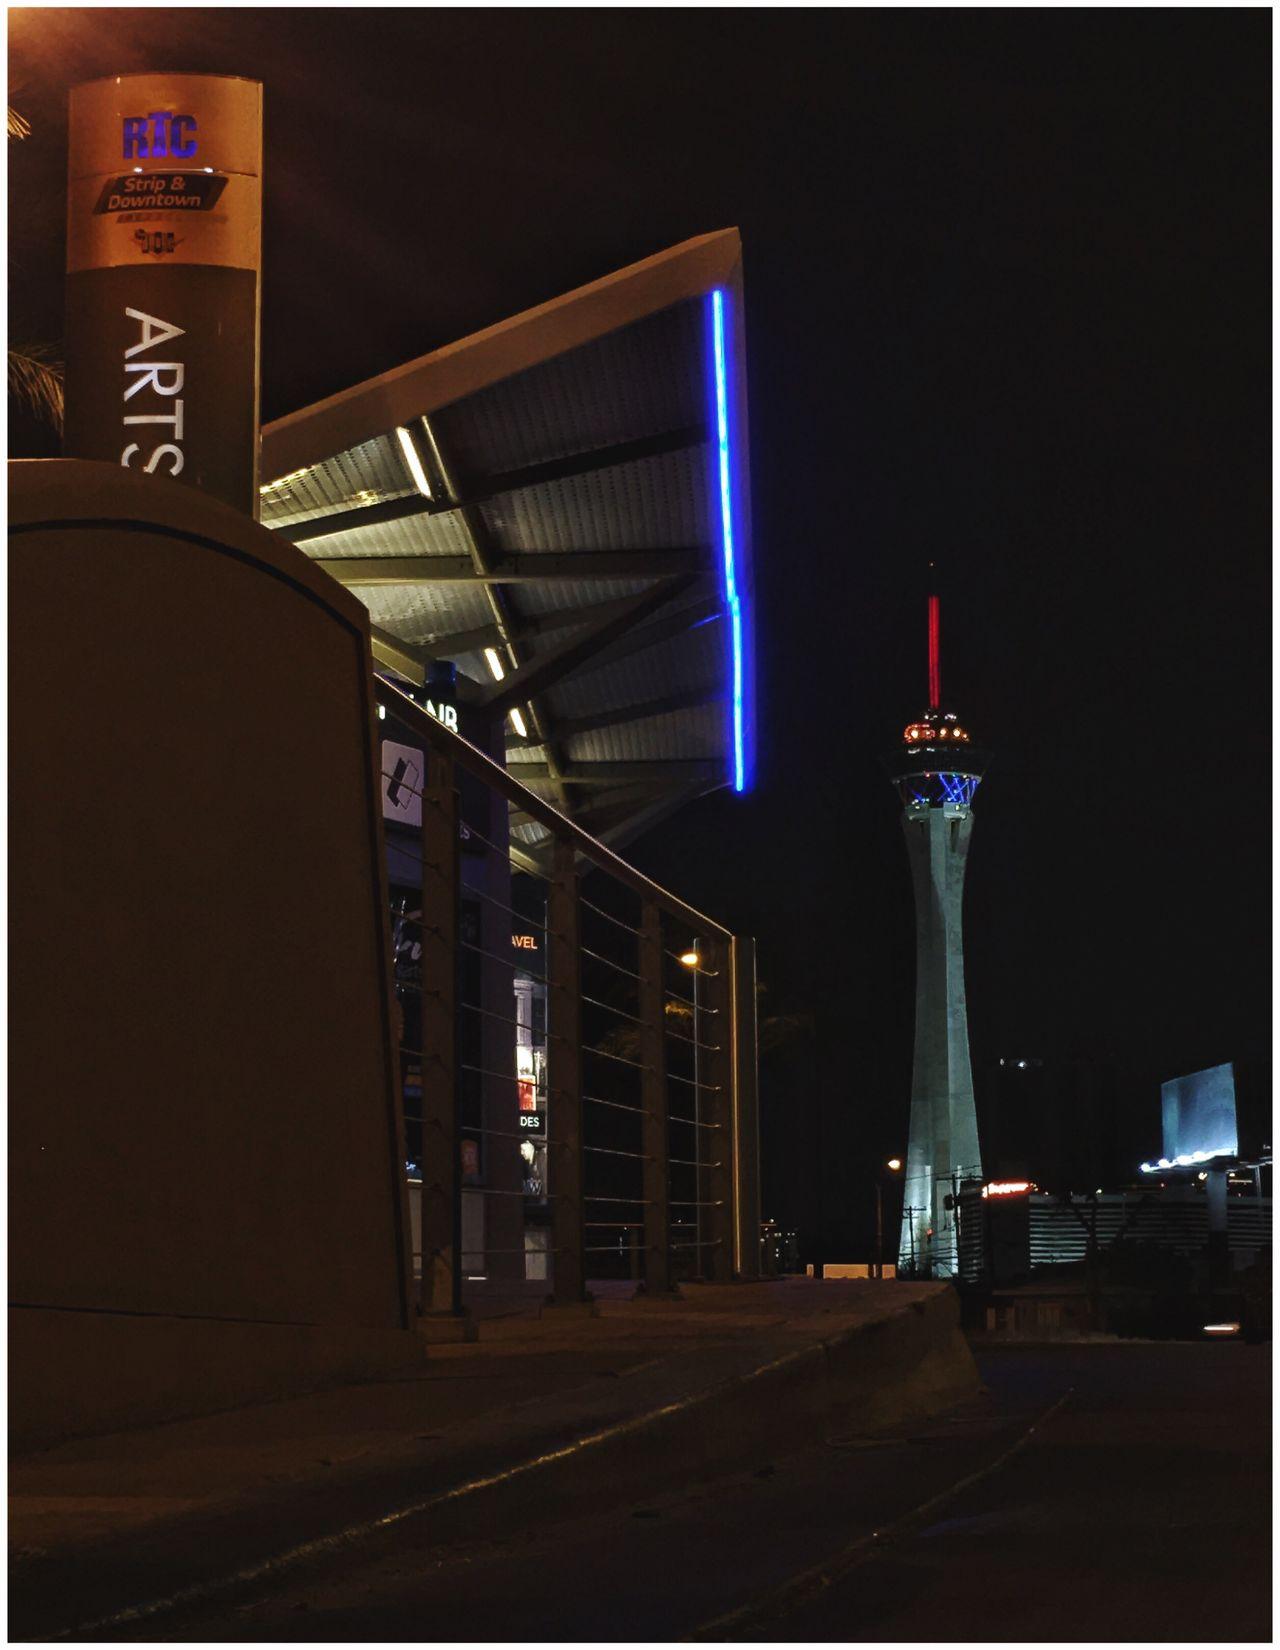 TheArtsDistrict Downtown Las Vegas Viva Las Vegas Art Urban Urban Landscape Urbanphotography Nopeople Night Nightphotography Night Lights Night Photography Nightlife IPhoneography This Week On Eyeem Malephotographerofthemonth Urban Geometry Picturing Las Vegas Overnight Success